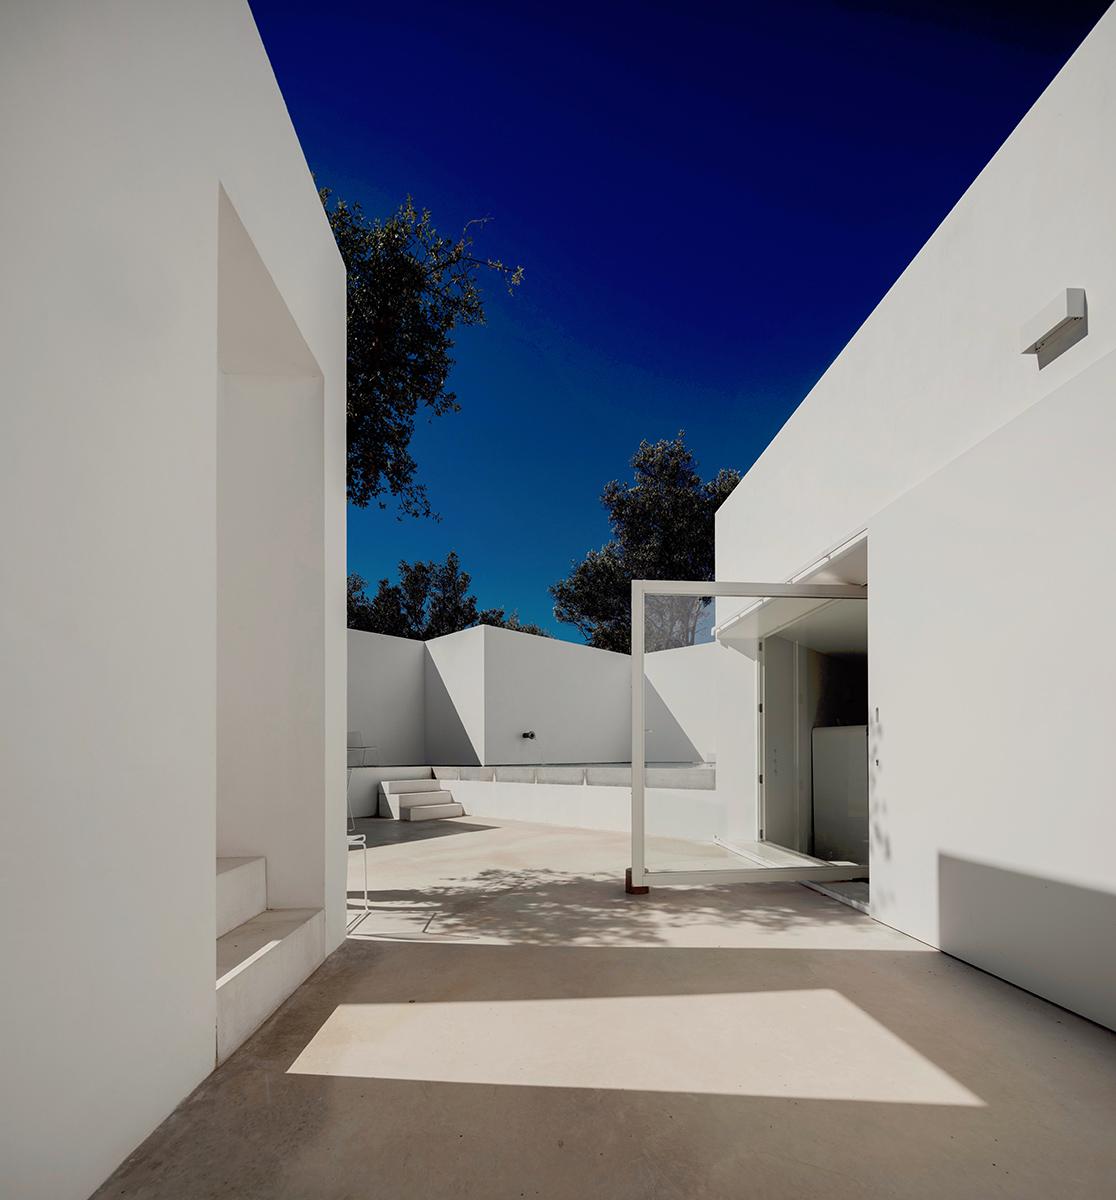 Zalig-Algarve-Casa-Luum-311